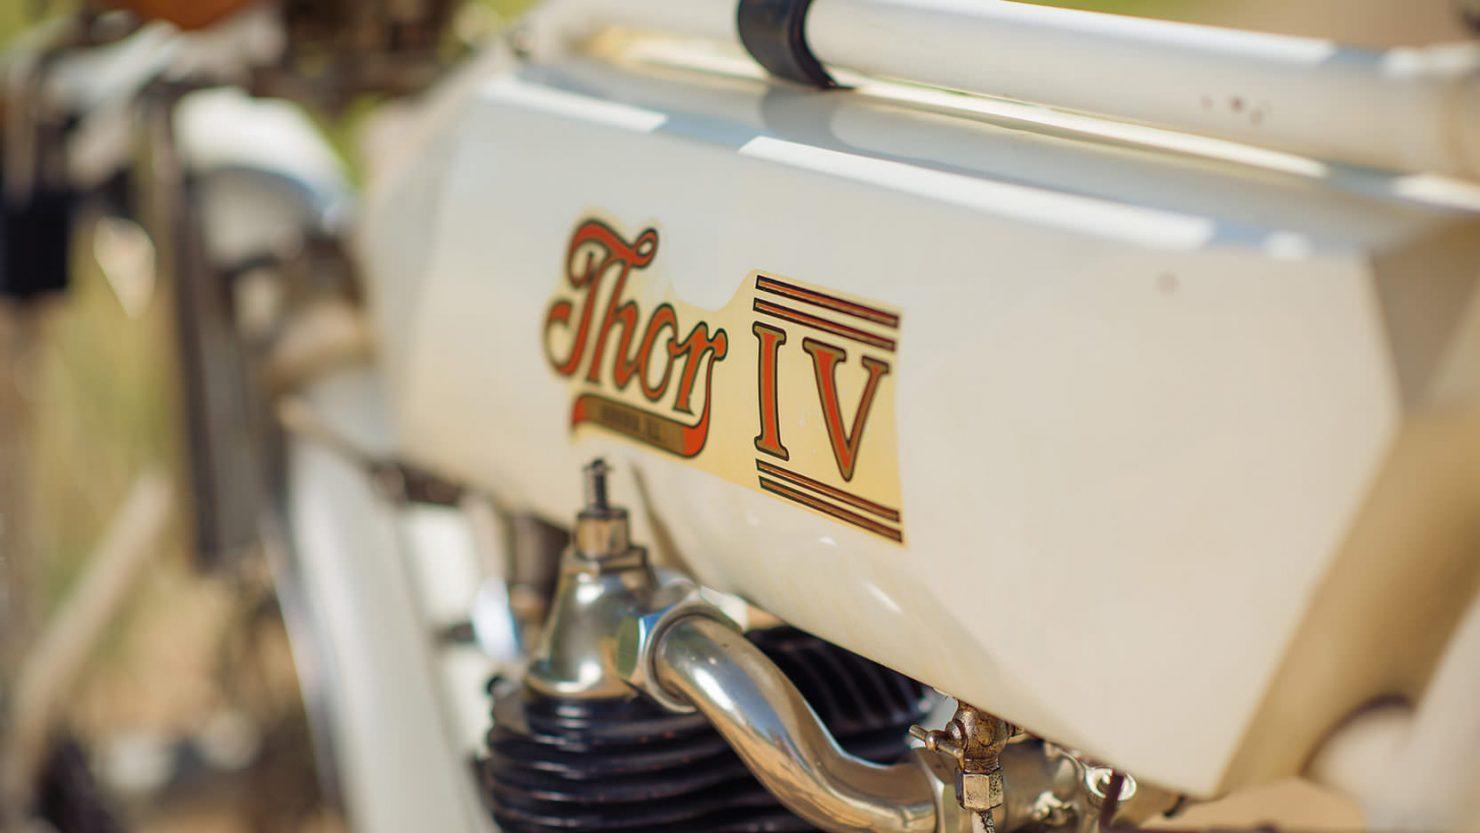 Thor Single Motorcycle 2 1480x833 - 1910 Thor Single